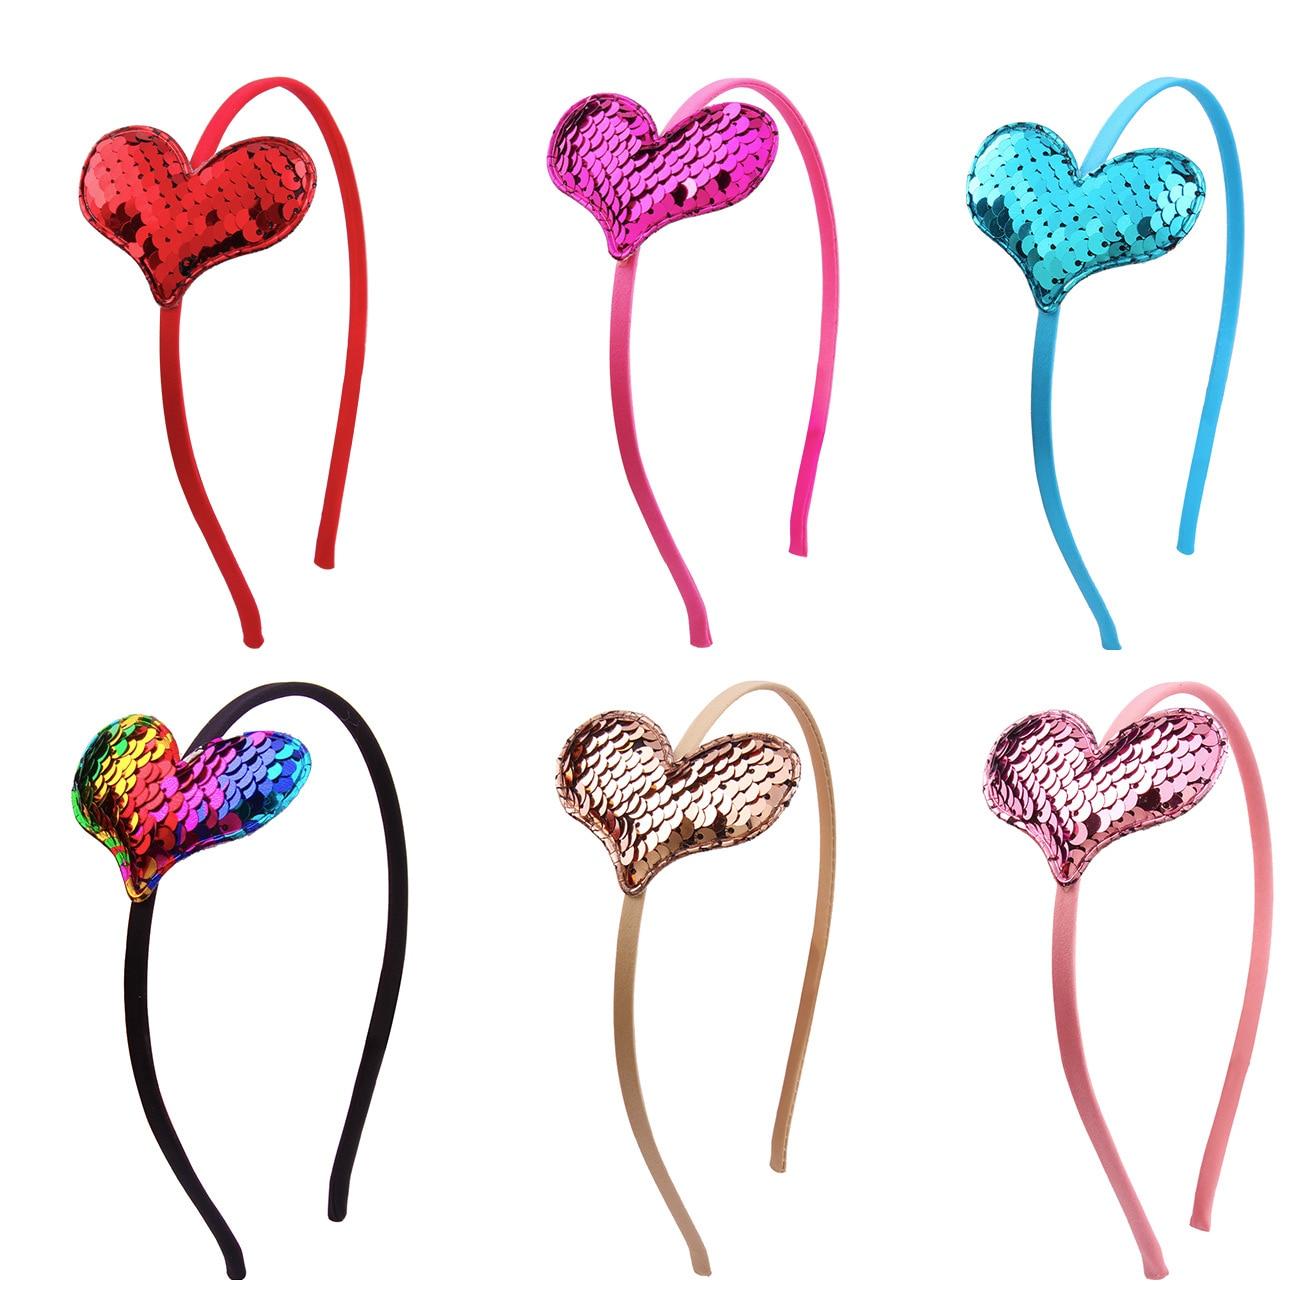 Gran oferta 2019, lazo de lentejuelas, amor para niños, diadema para orejas Reversible de lentejuelas, Boutique, diadema dura para niños, accesorios para el cabello para niñas